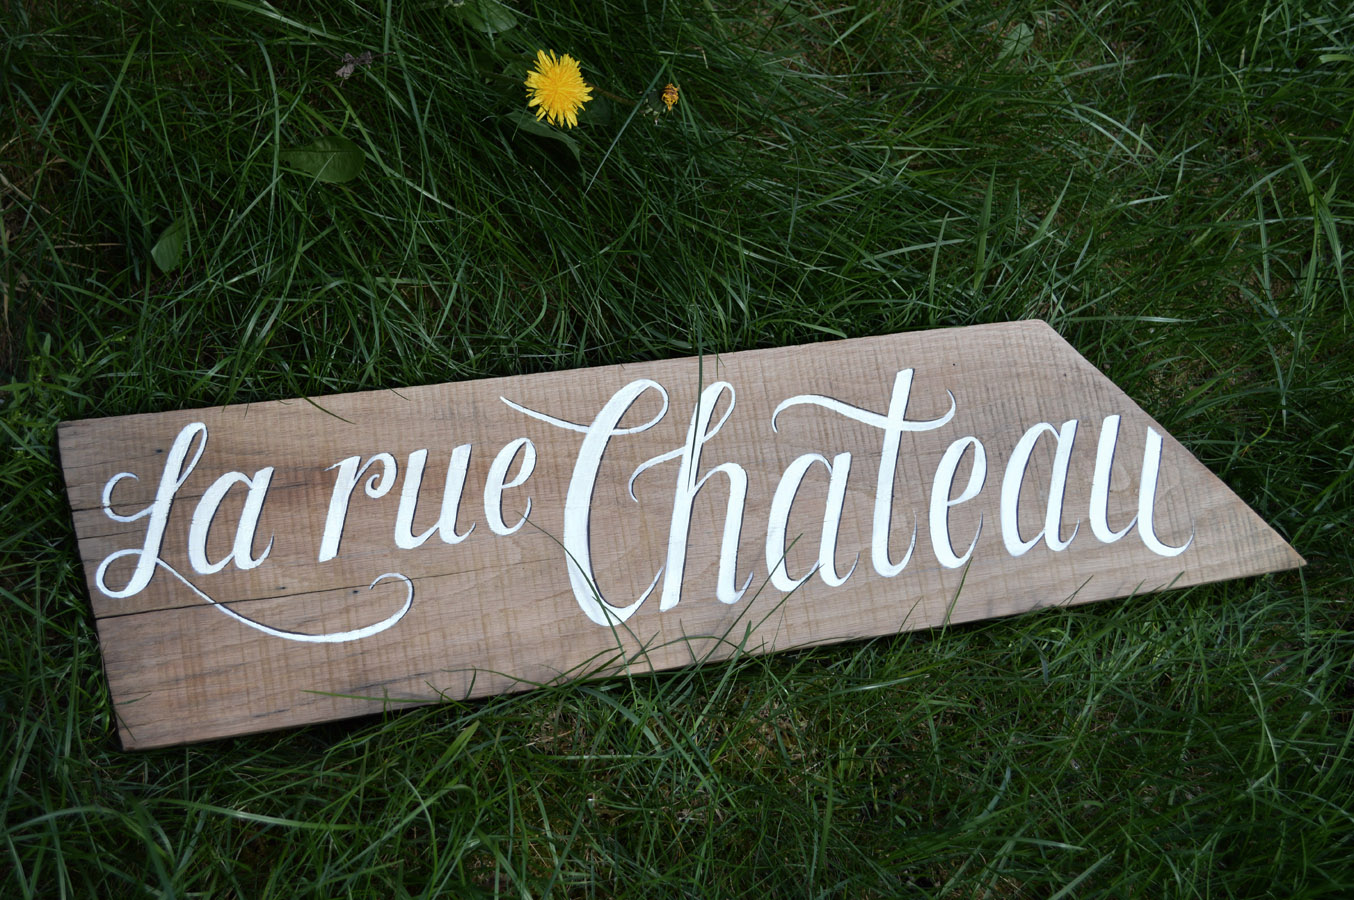 Letterhand-Laruechateau-kl